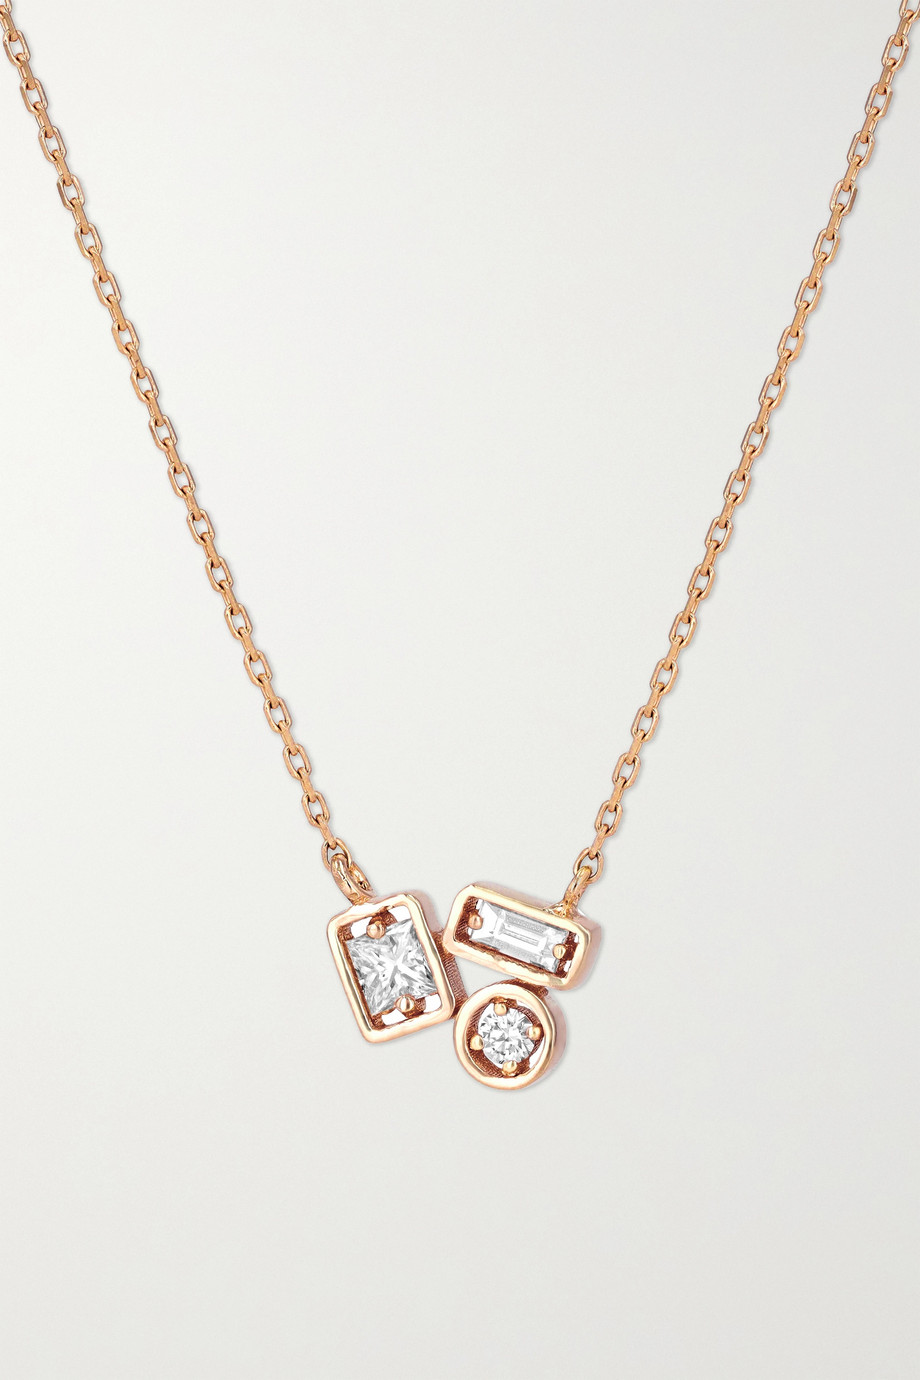 Suzanne Kalan 18K 玫瑰金钻石项链